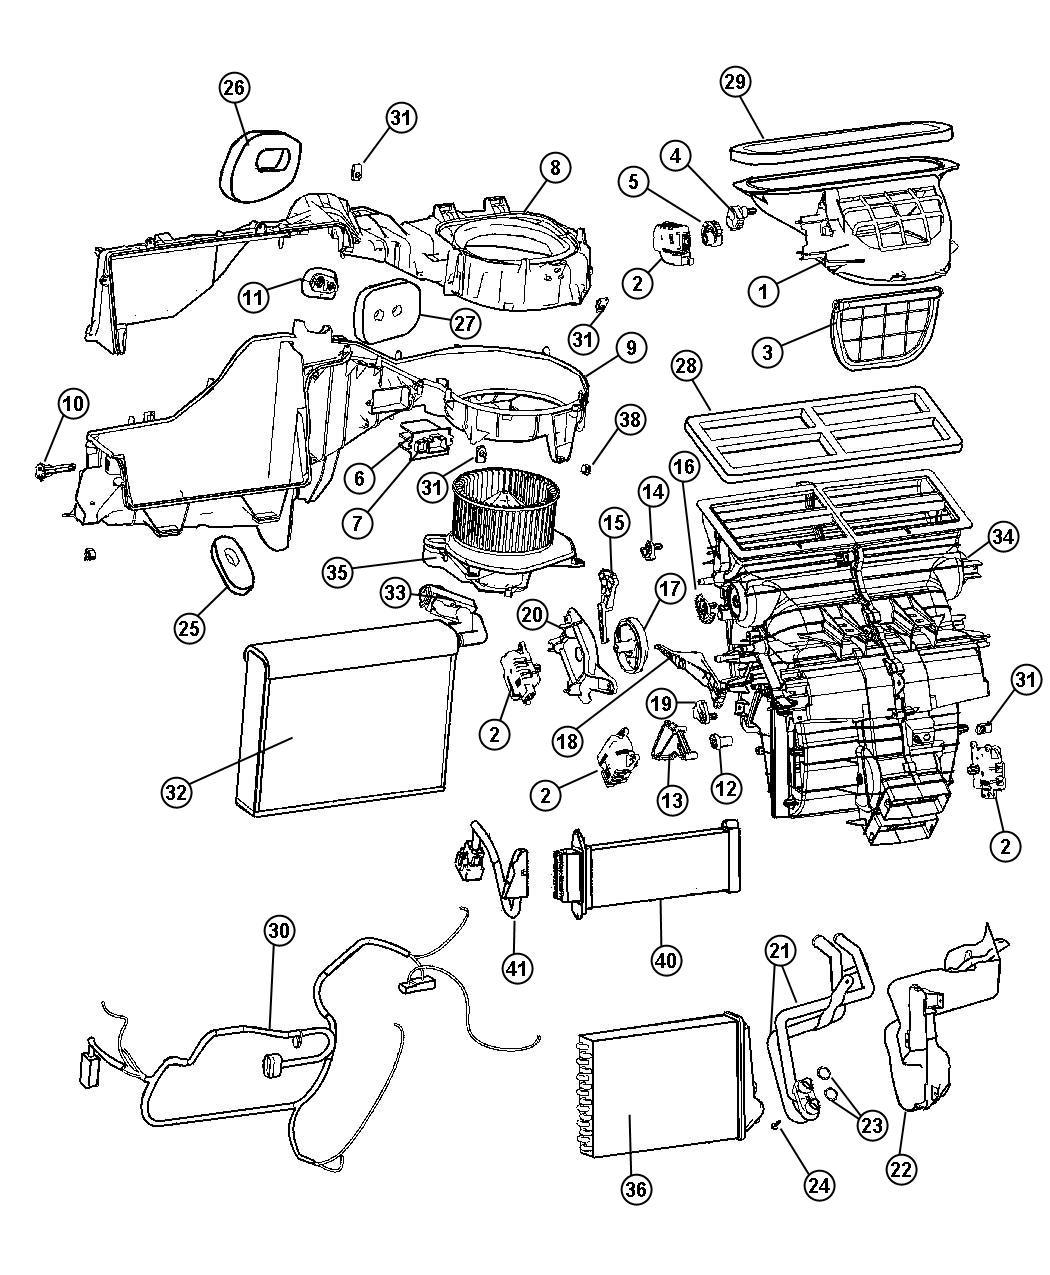 Jeep Grand Cherokee O ring. Heater core, heater core tubes